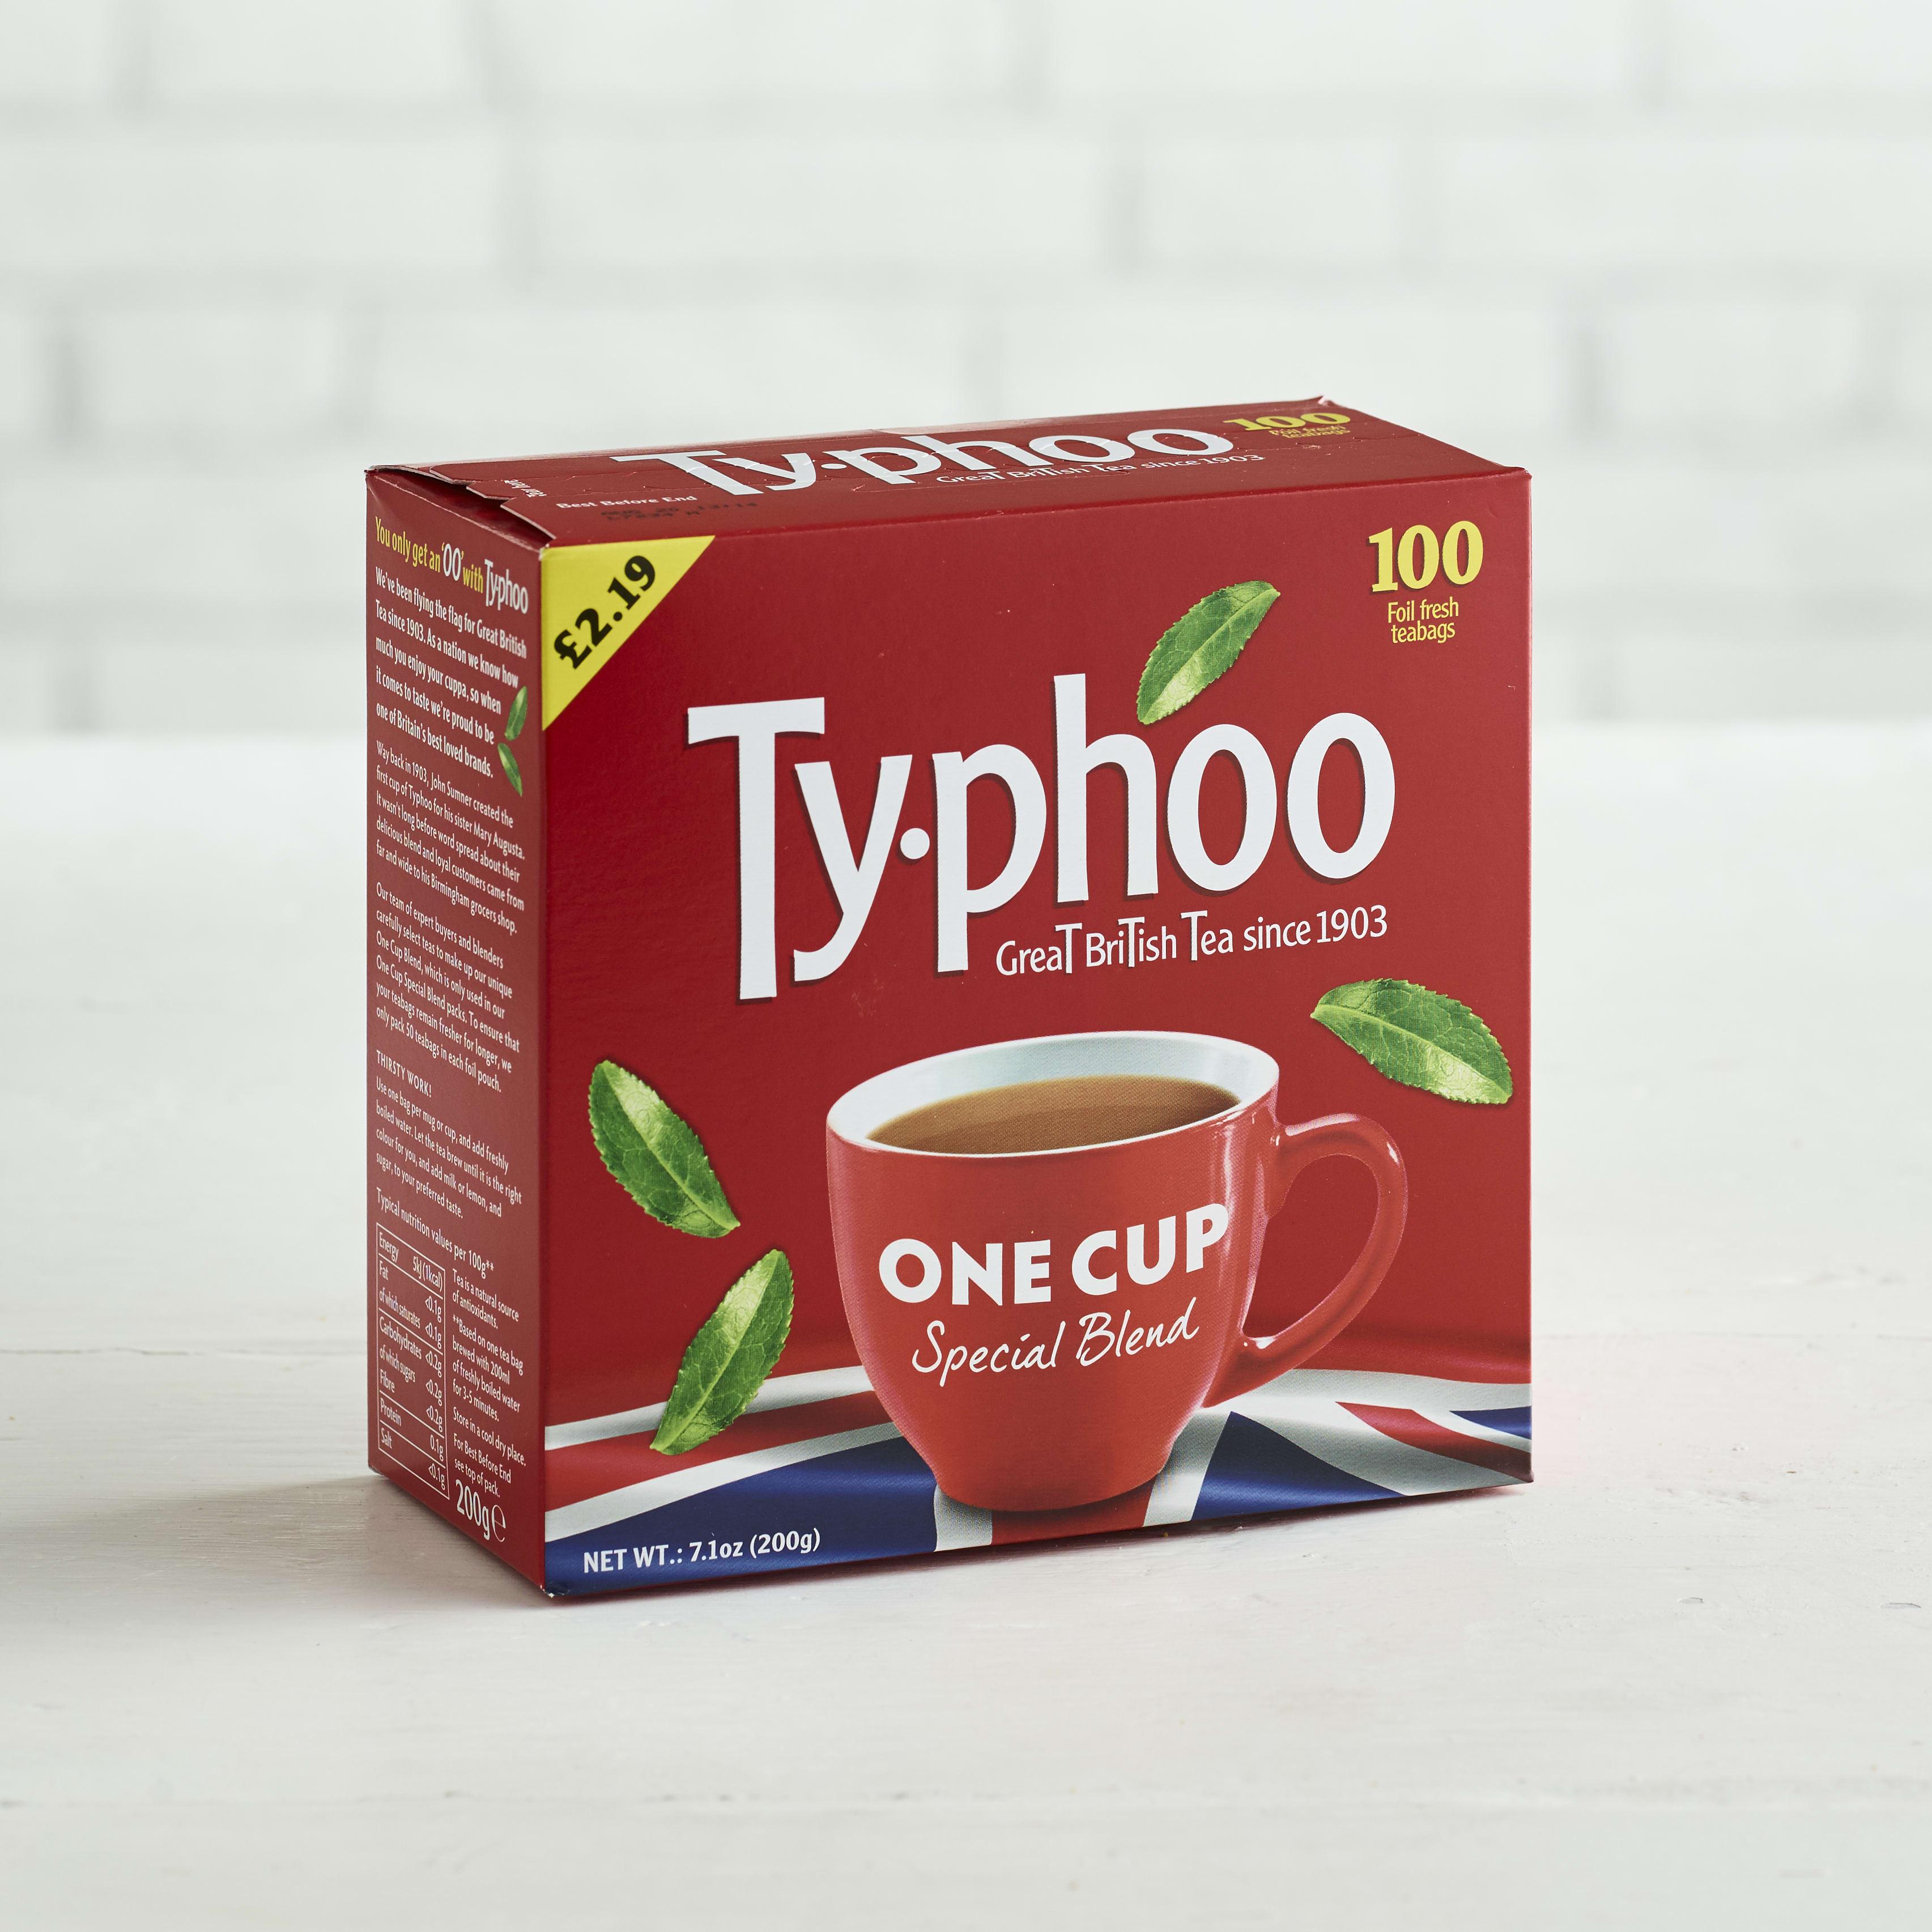 Typhoo One Cup Tea, 100 Bags